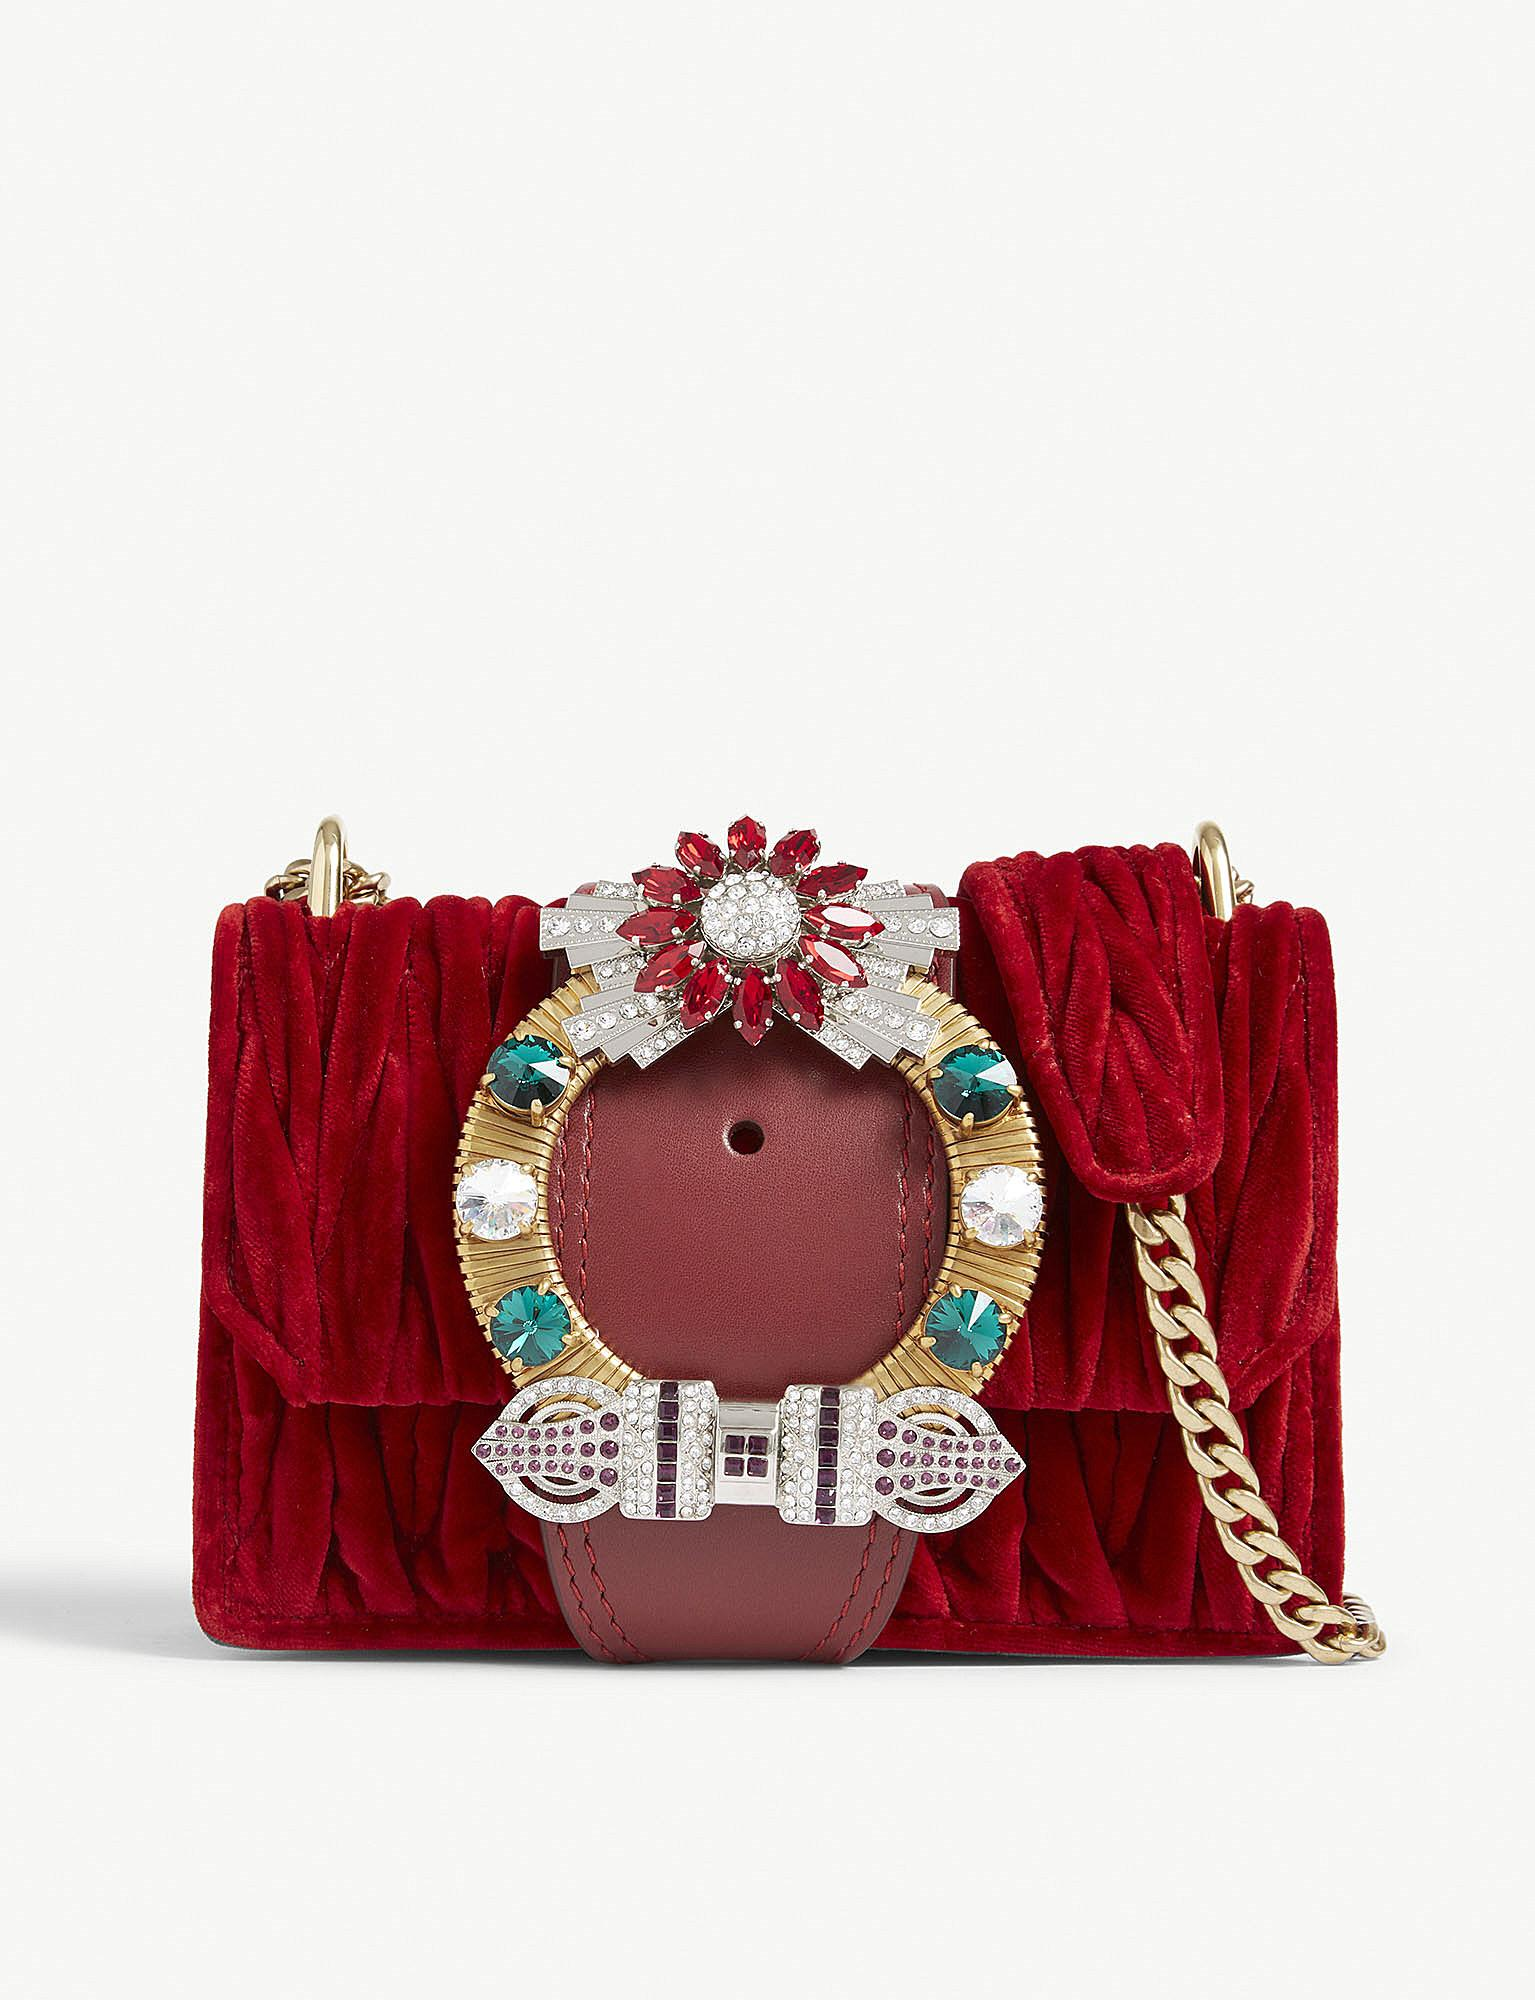 a2c075afeb0 Miu Miu Lady Matelasse Shoulder Bag in Red - Lyst